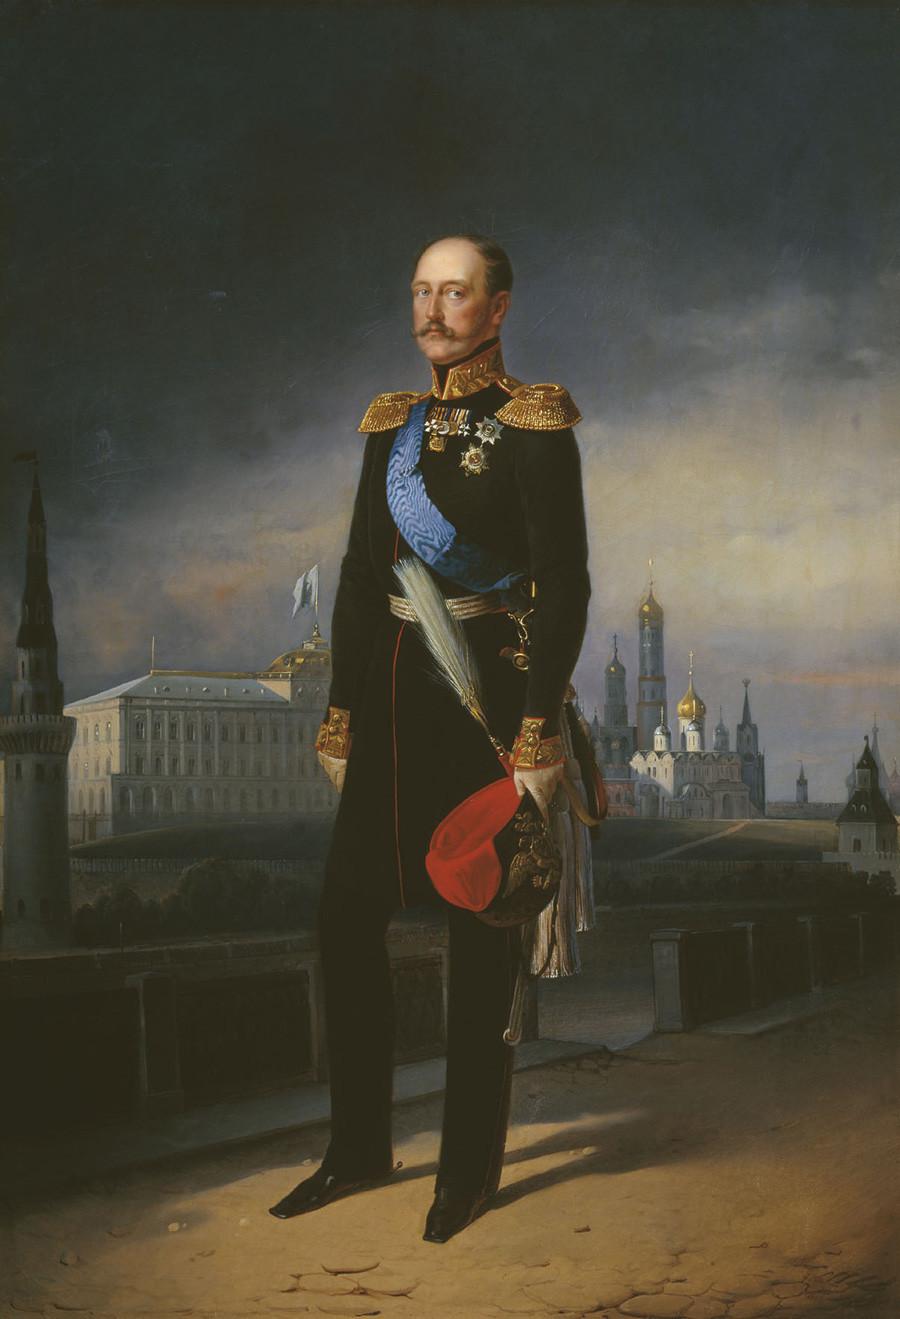 'Retrato de Nicolau 1º', de Egor Botman